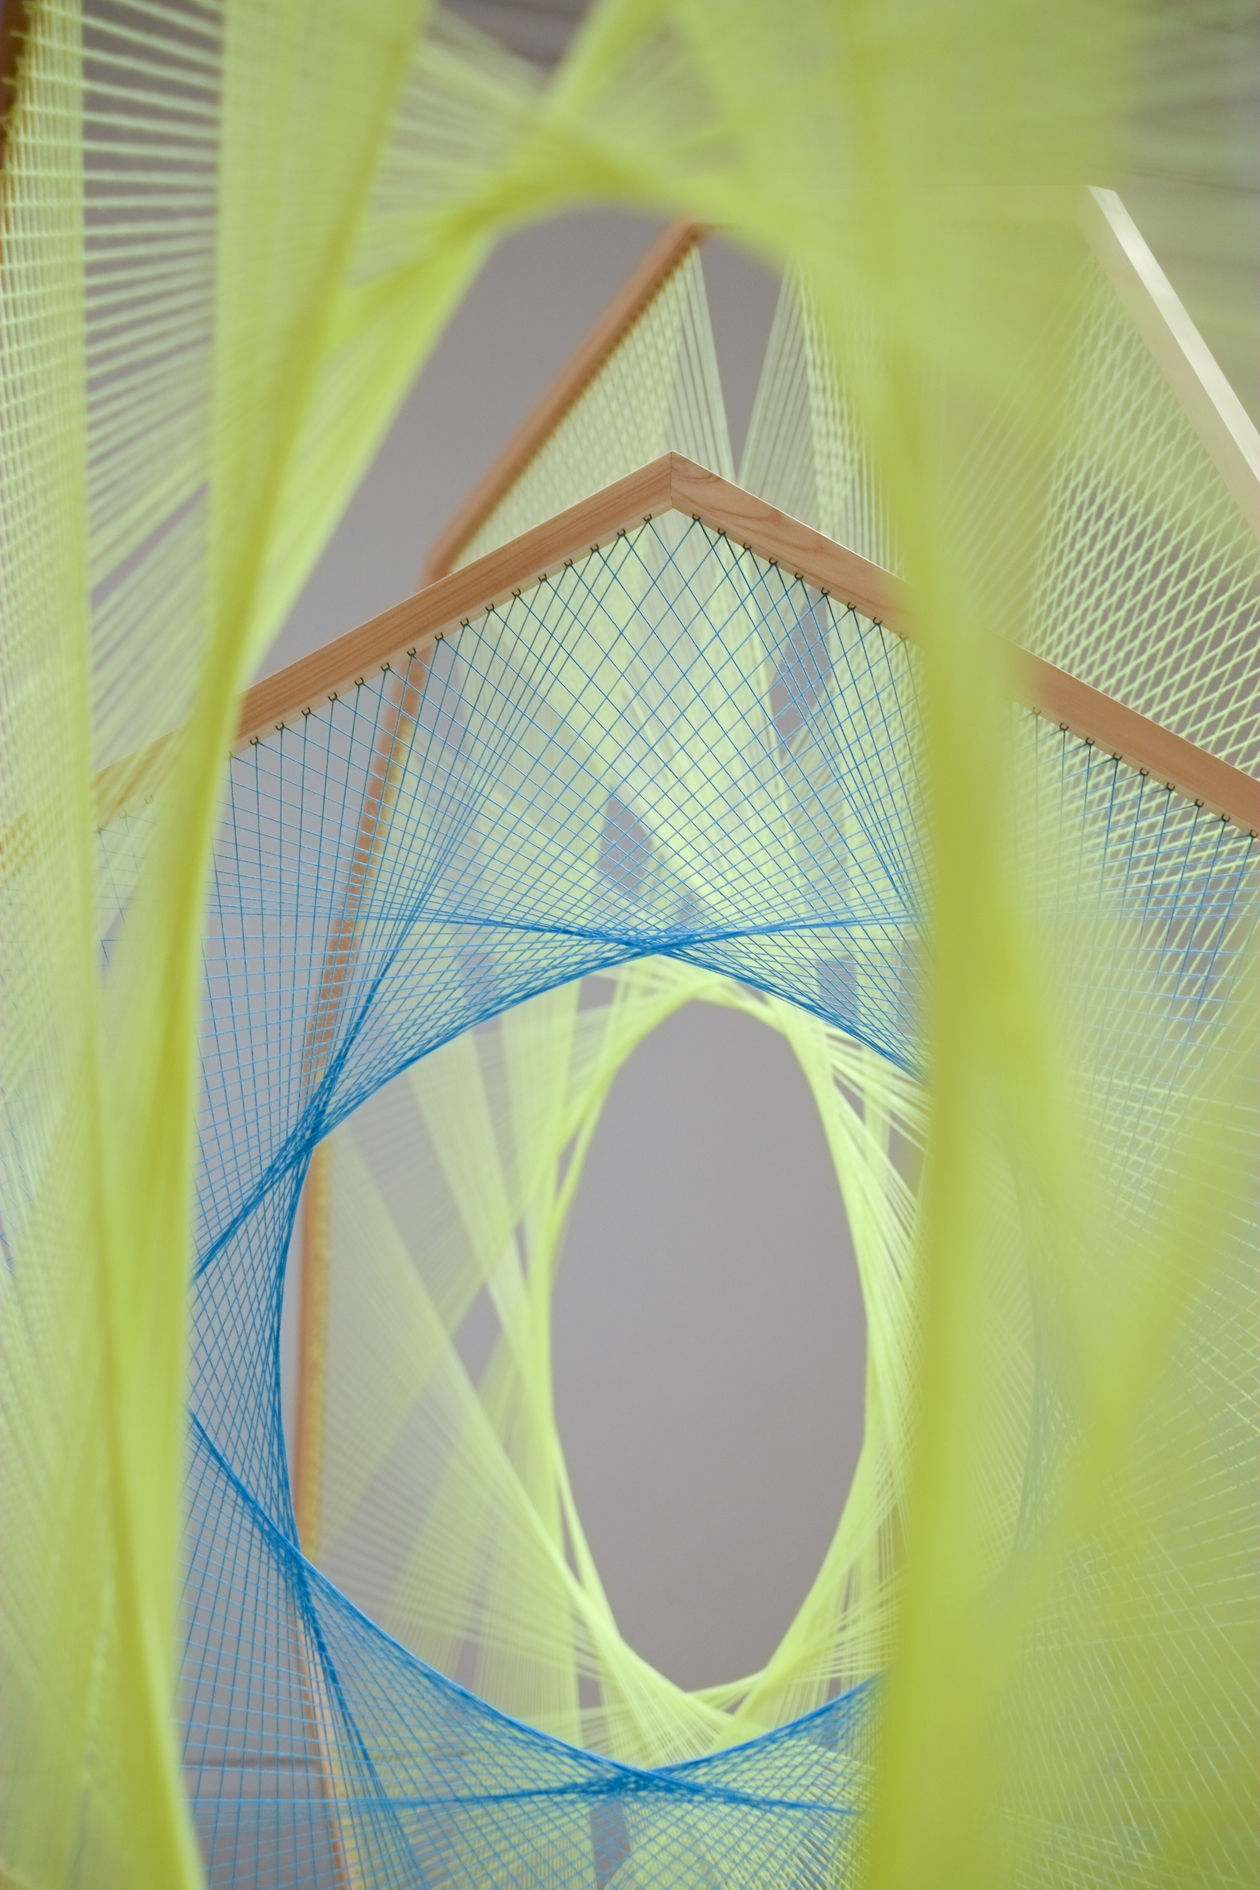 NIKE SAVVAS     Sliding Ladders: yellow with blue pentagon (detail)  2012 wool, wood, steel, image credit: Jonty Wilde 382 x 231.5 cm